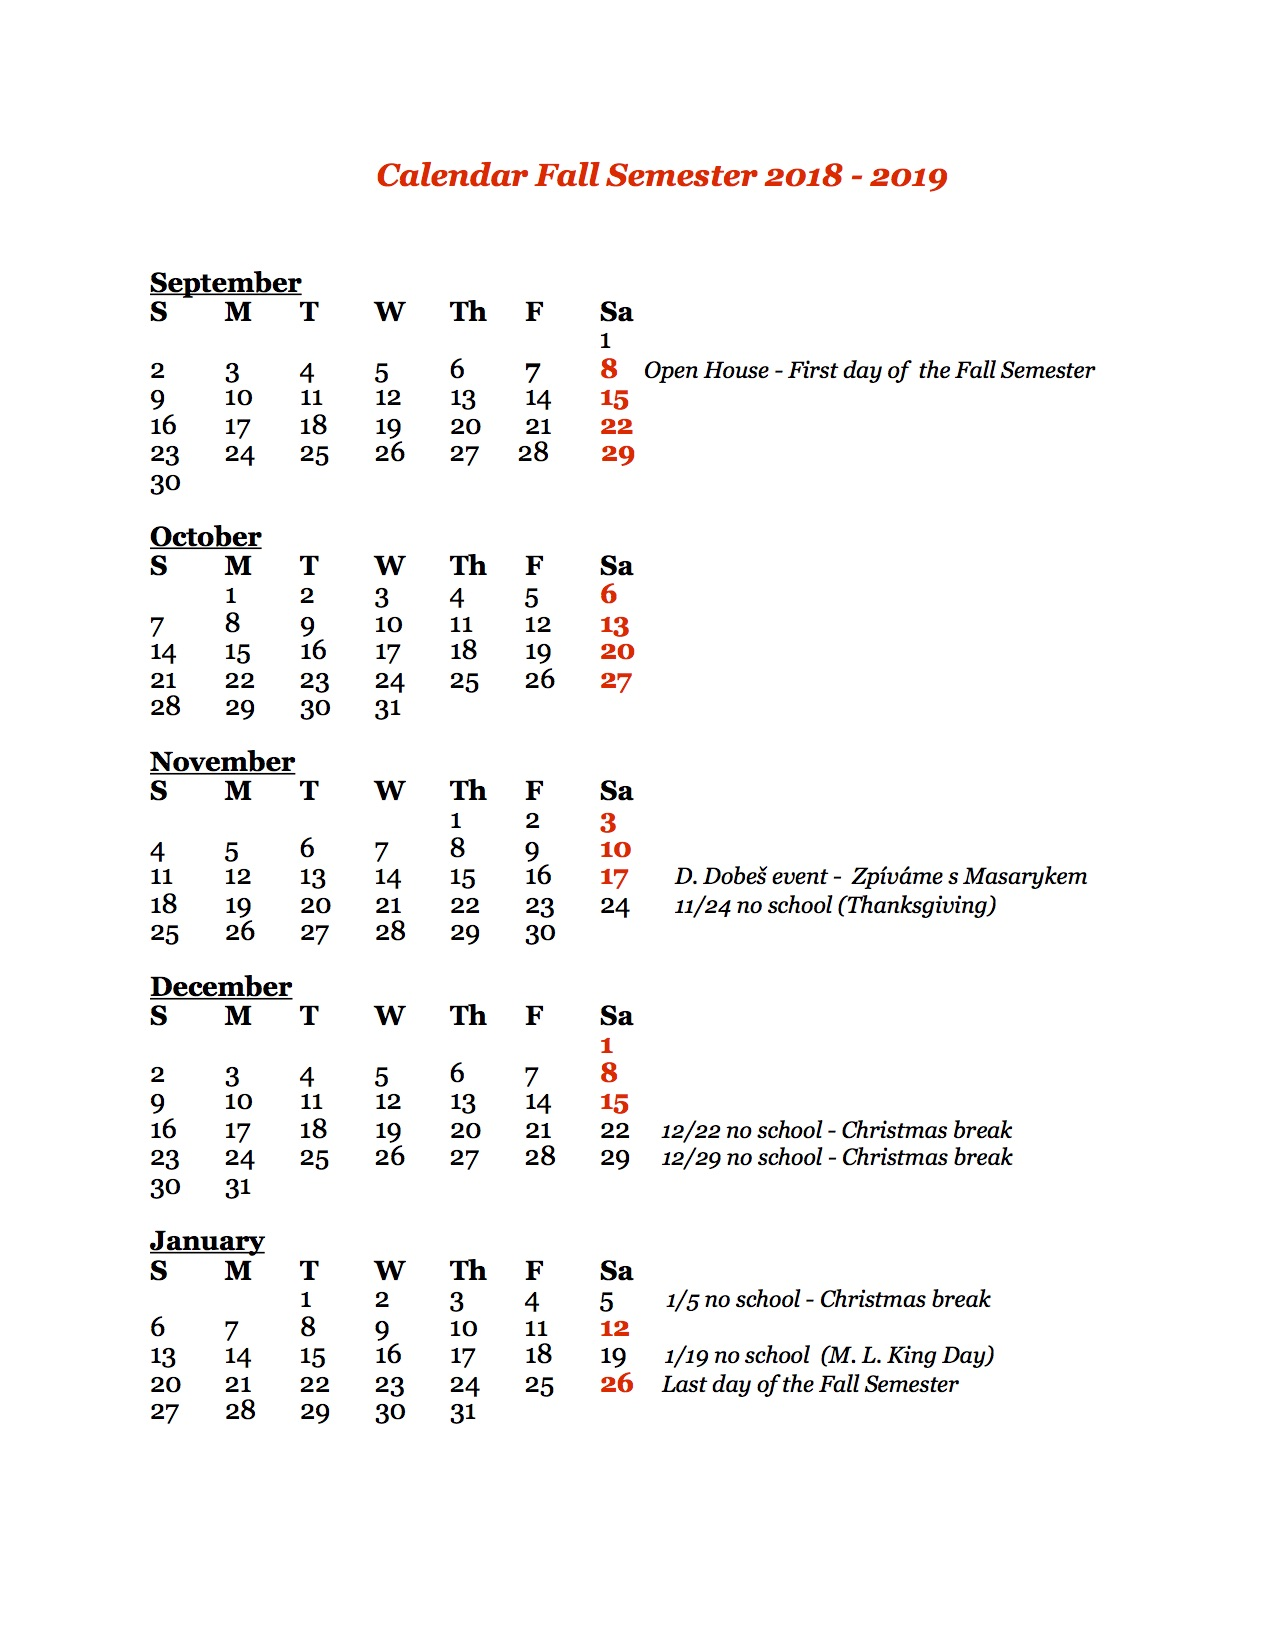 kalendar pro rodice Fall 2017